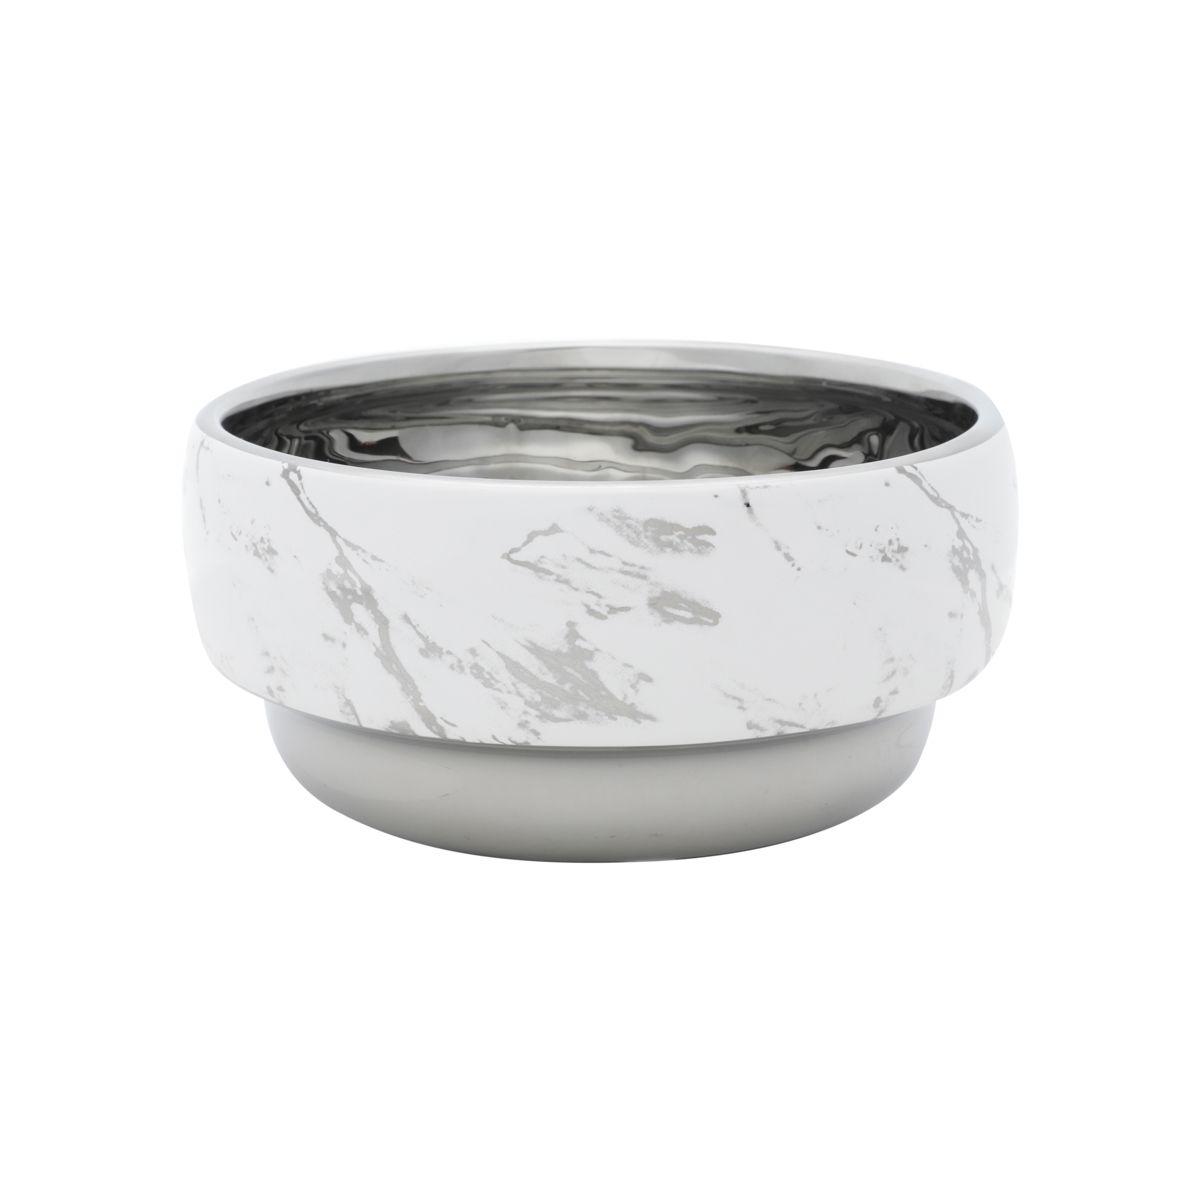 Centro De Mesa Cerâmica Branco 15x8cm